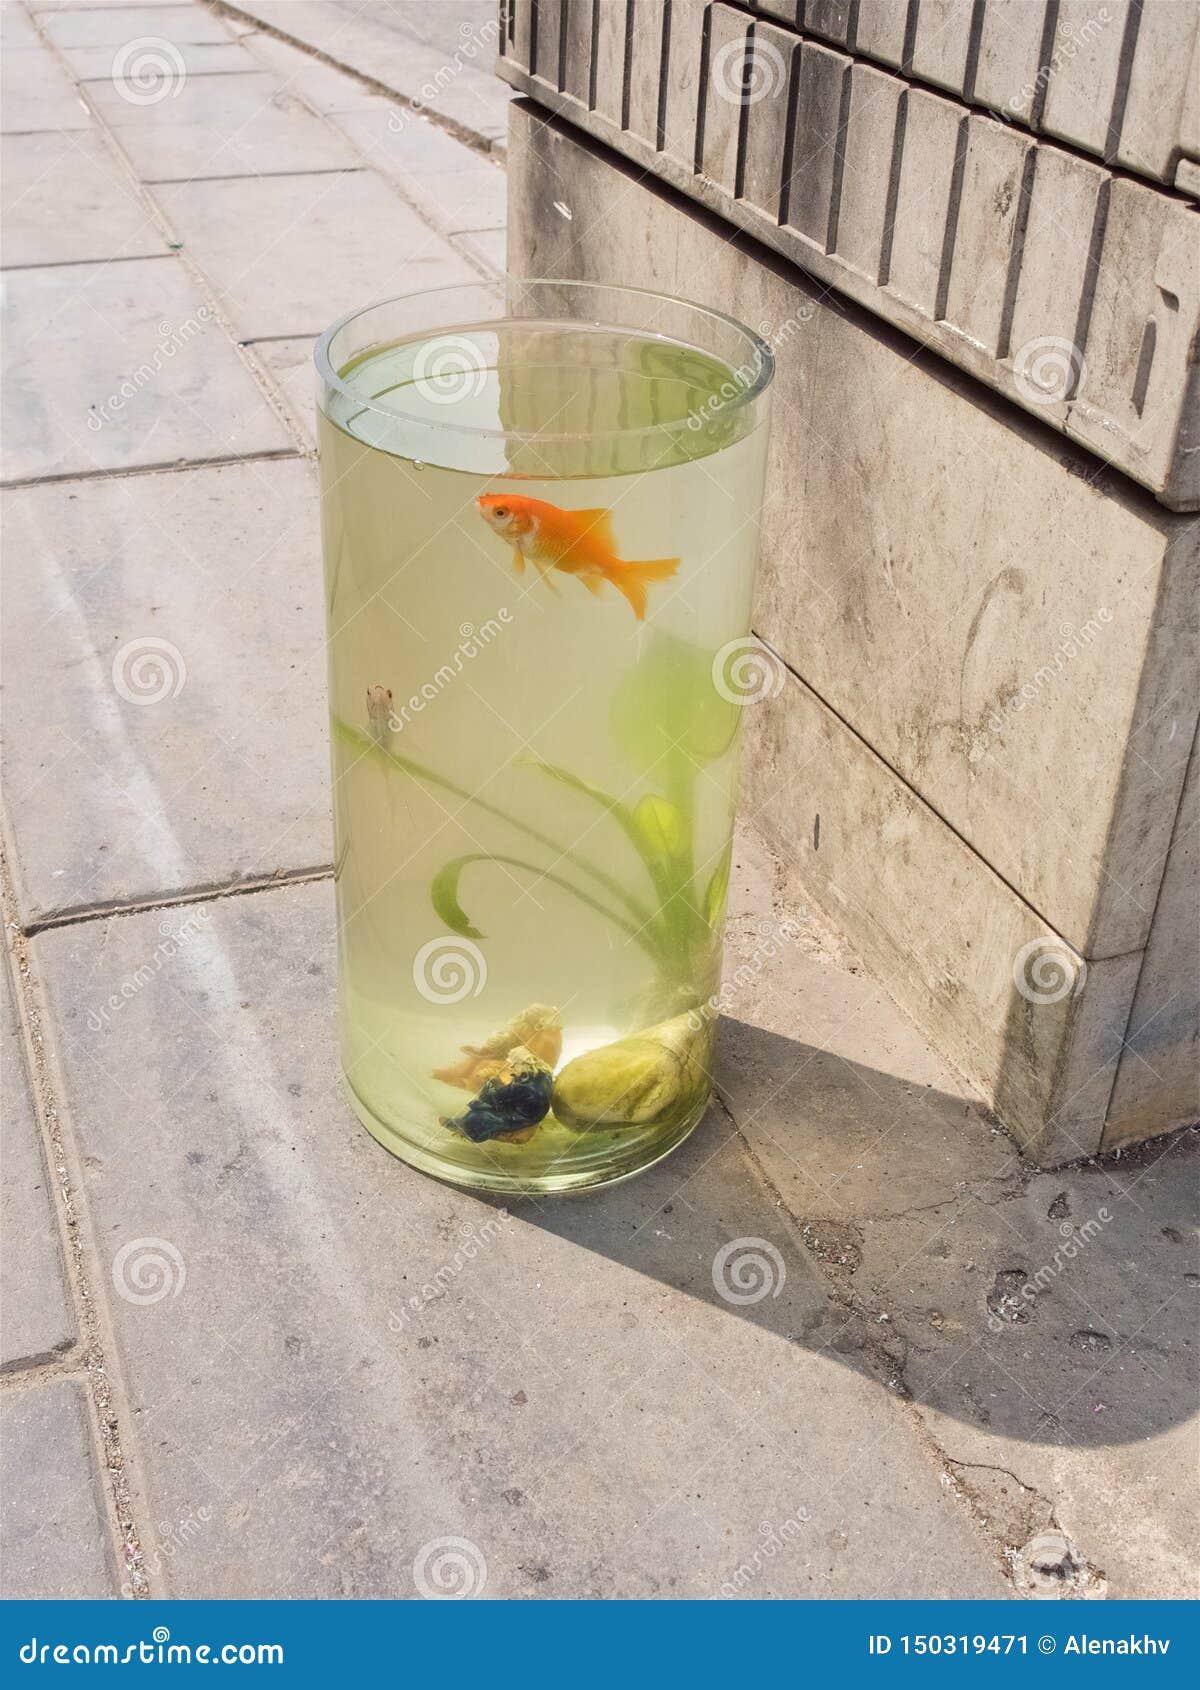 Goldfish in an aquarium standing on the sidewalk in the street